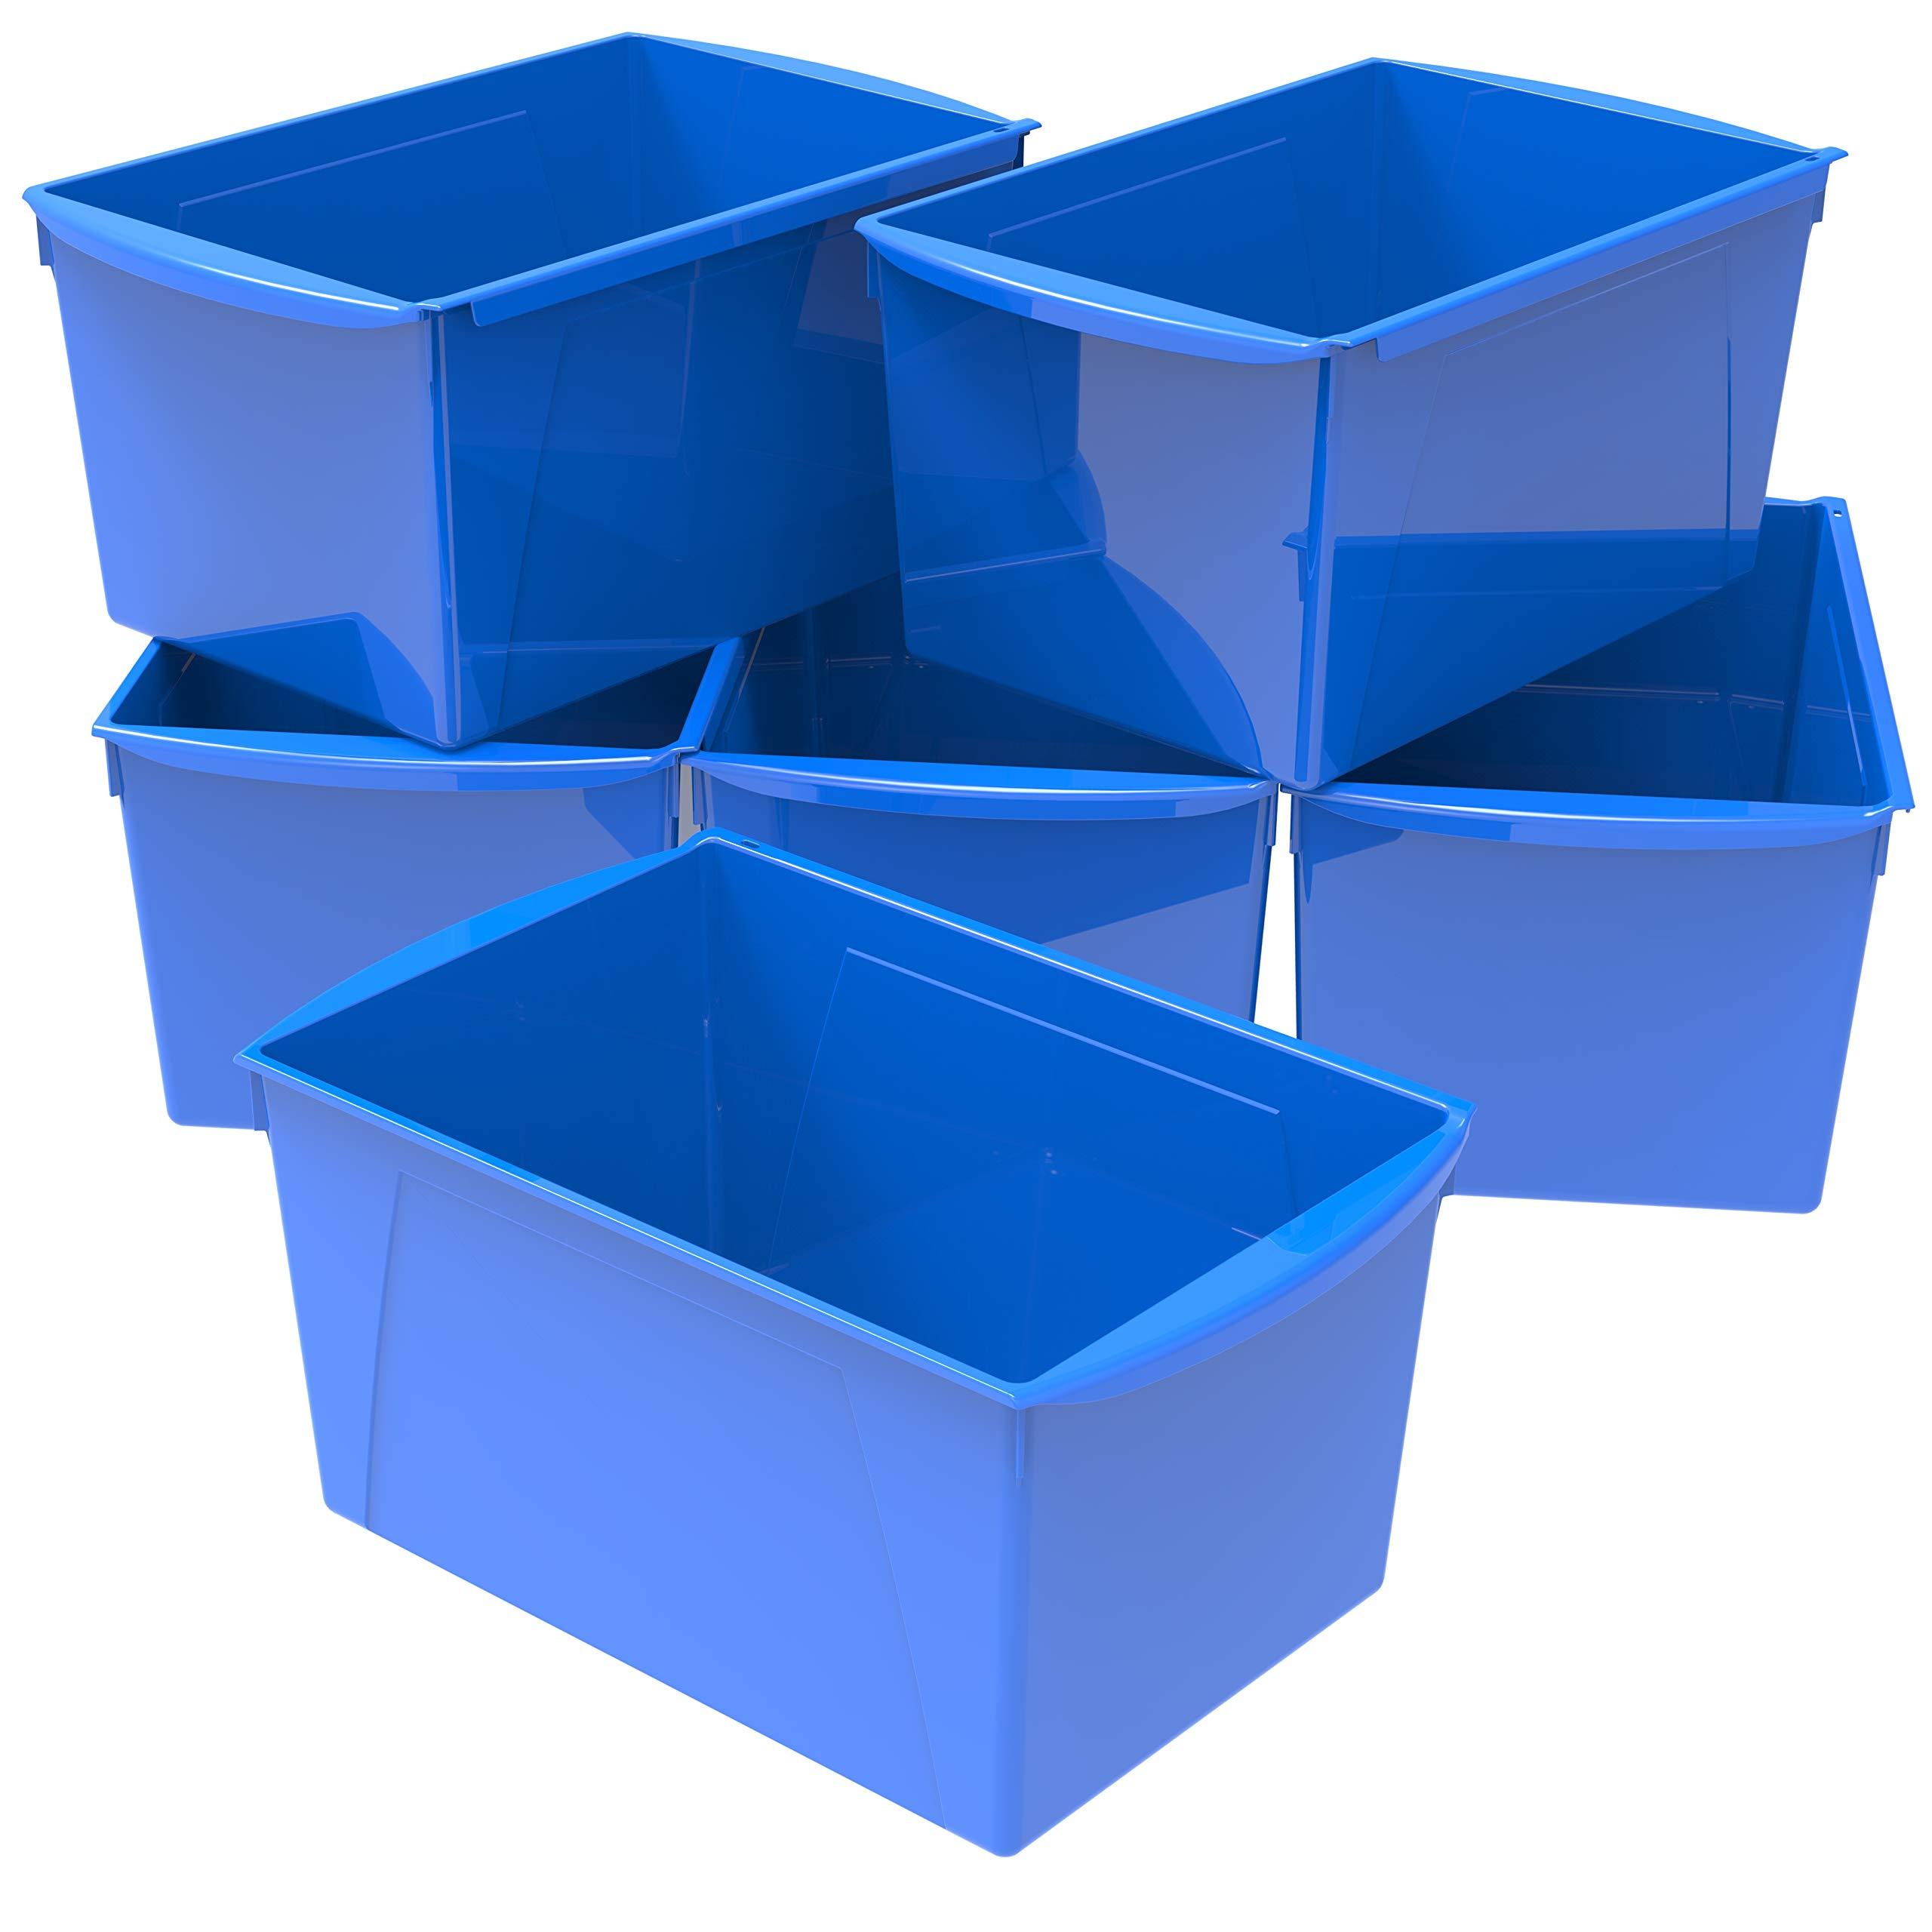 Storex Extra Large Book Bin, Blue, 6-Pack